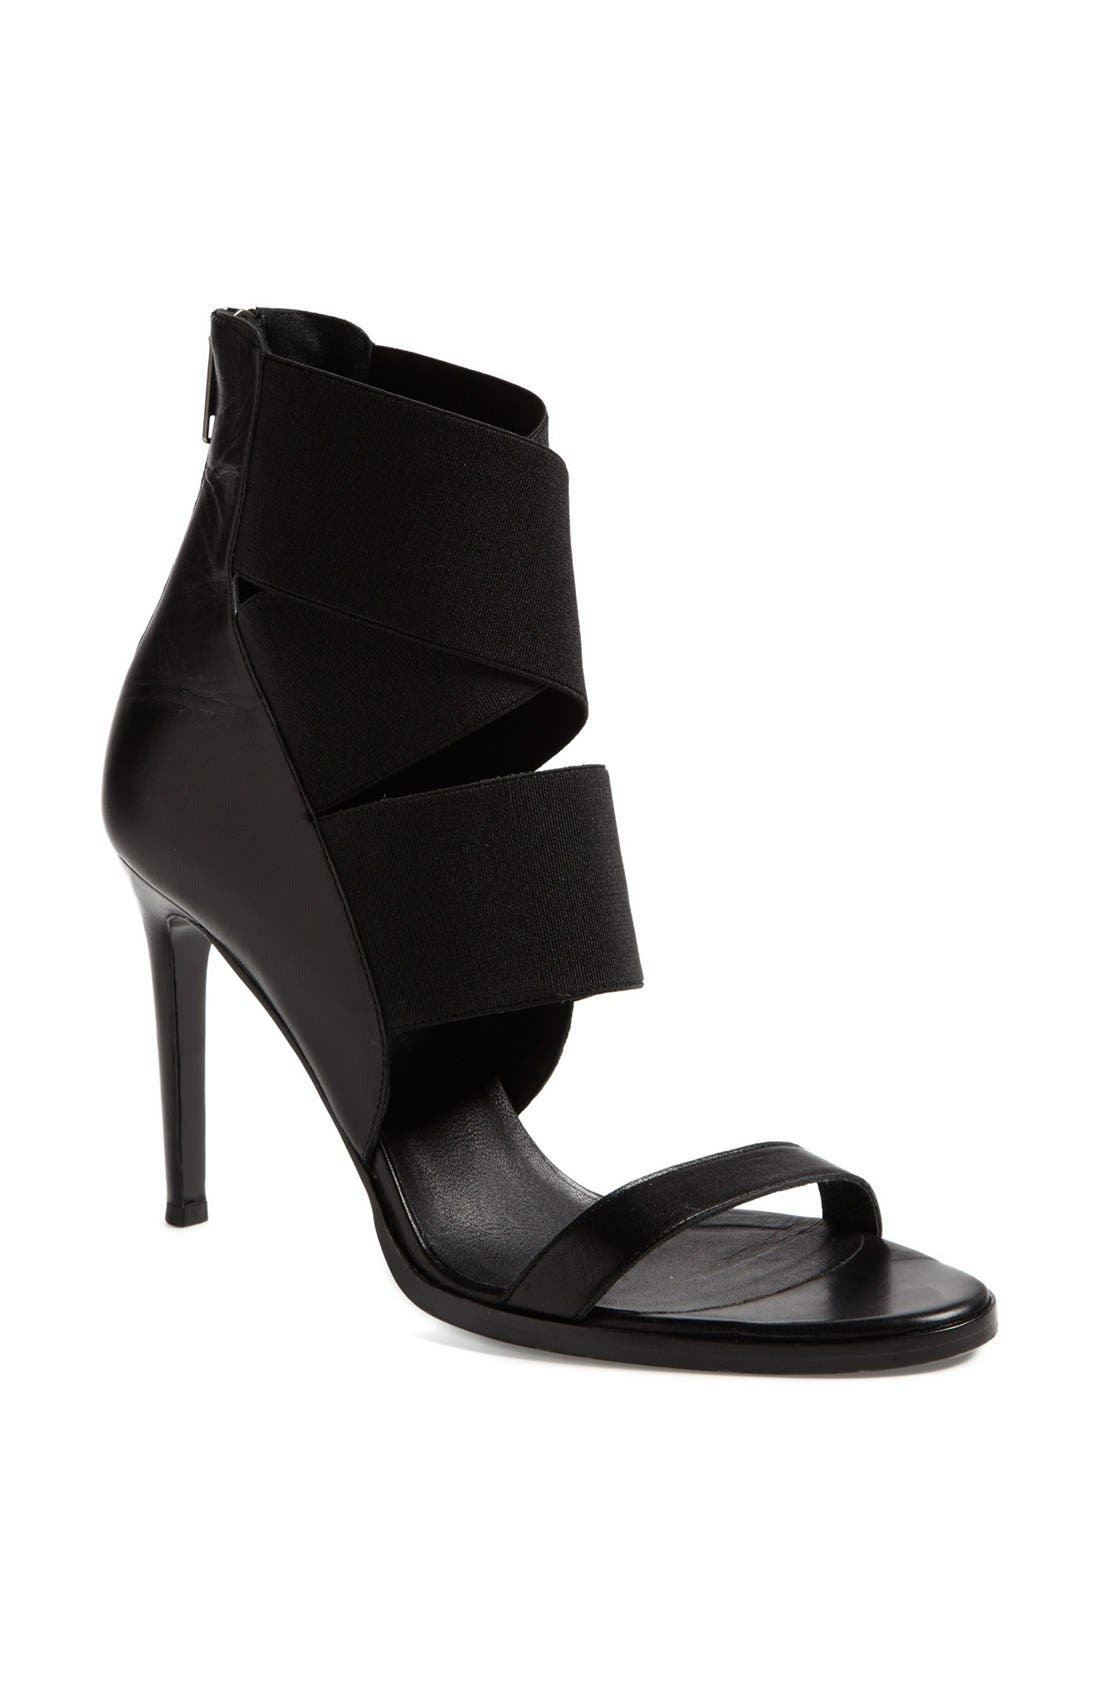 Main Image - Helmut Lang 'Silt' Sandal (Online Only)